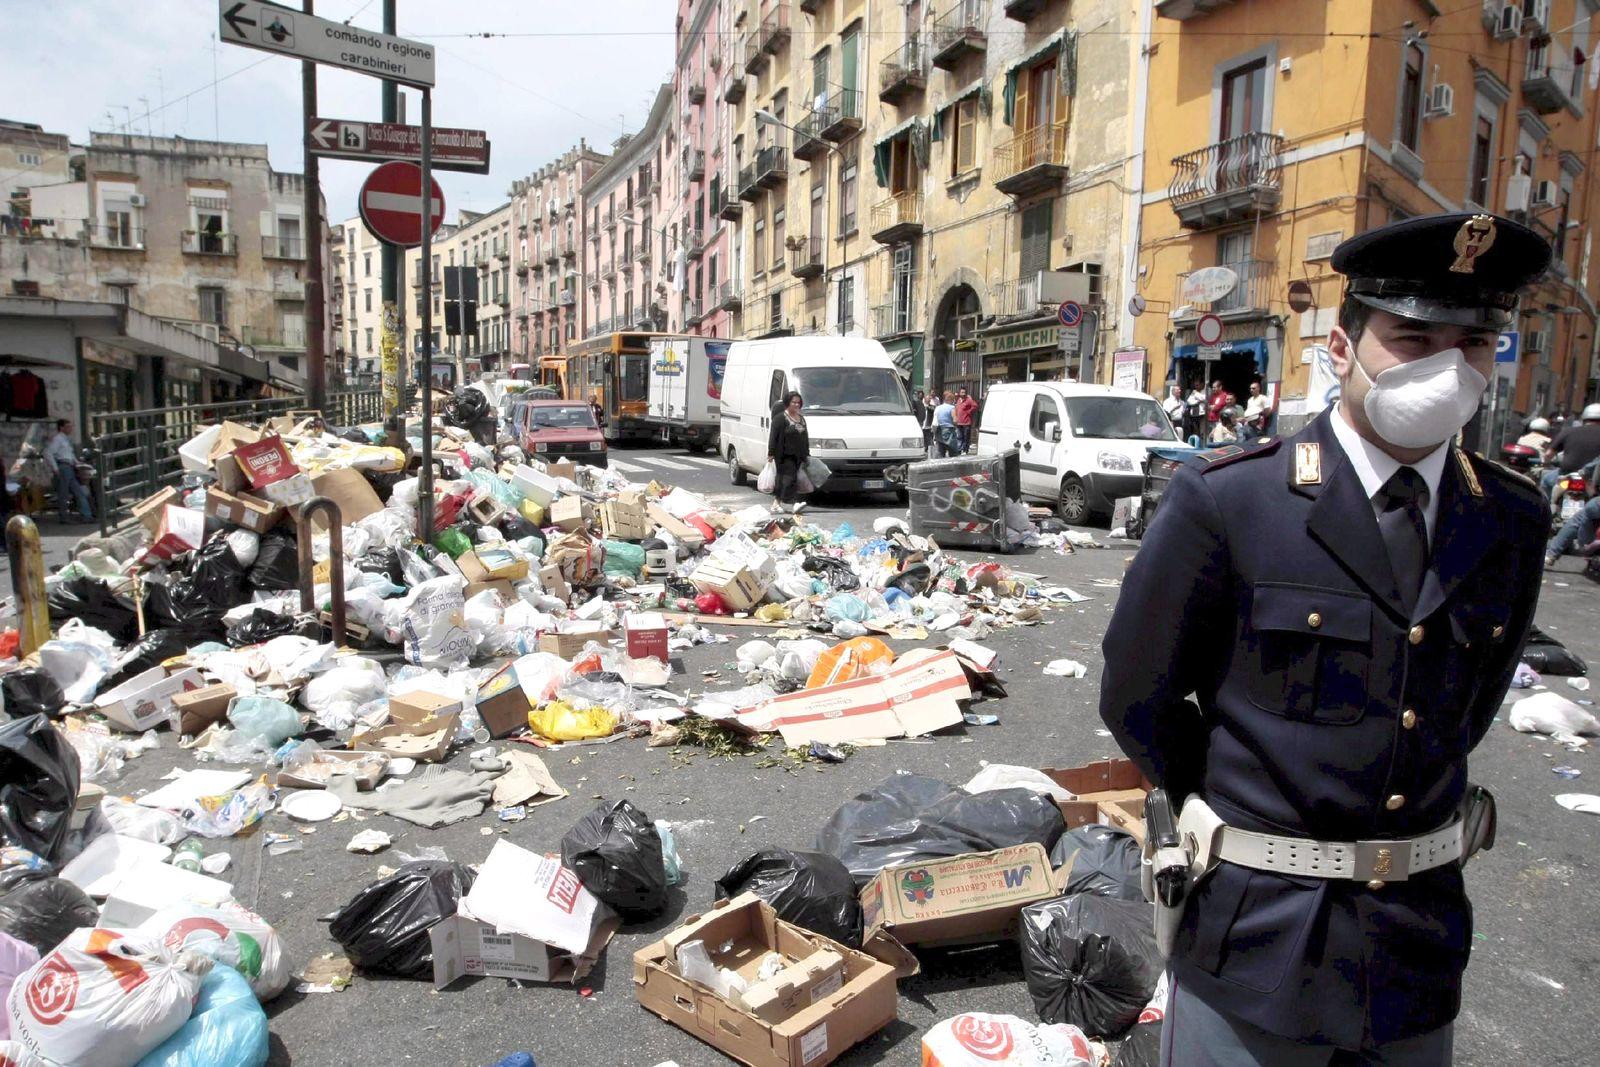 Müllchaos in Neapel 2008